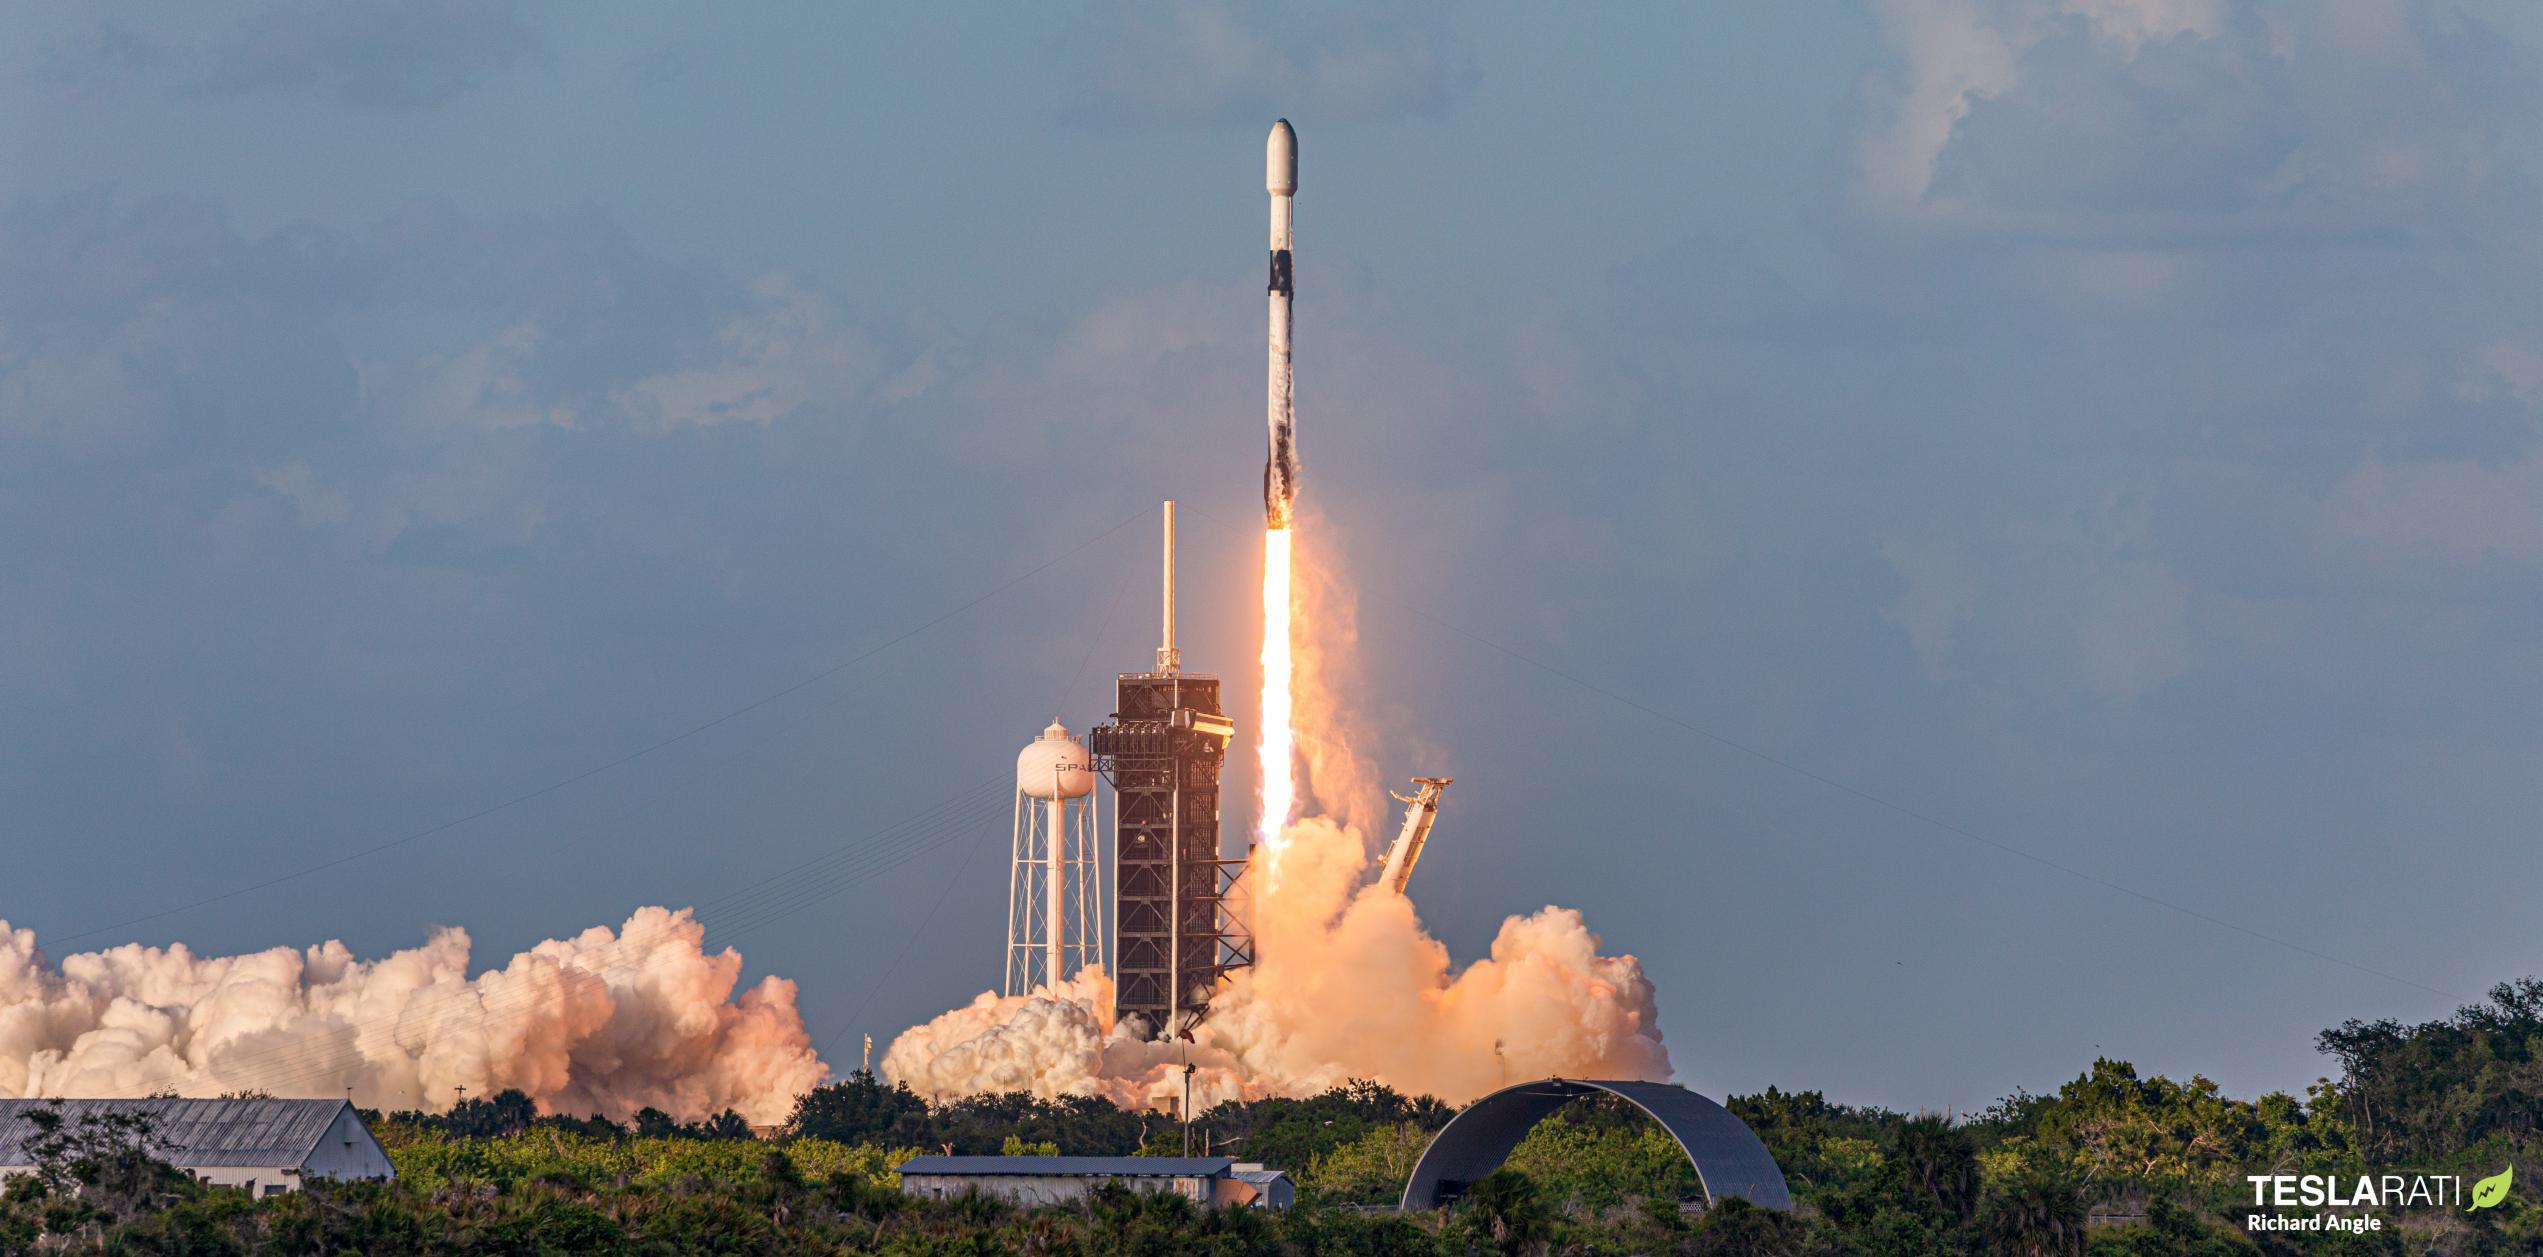 Starlink-26 Falcon 9 B1058 39A 051521 (Richard Angle) 1 crop (c)